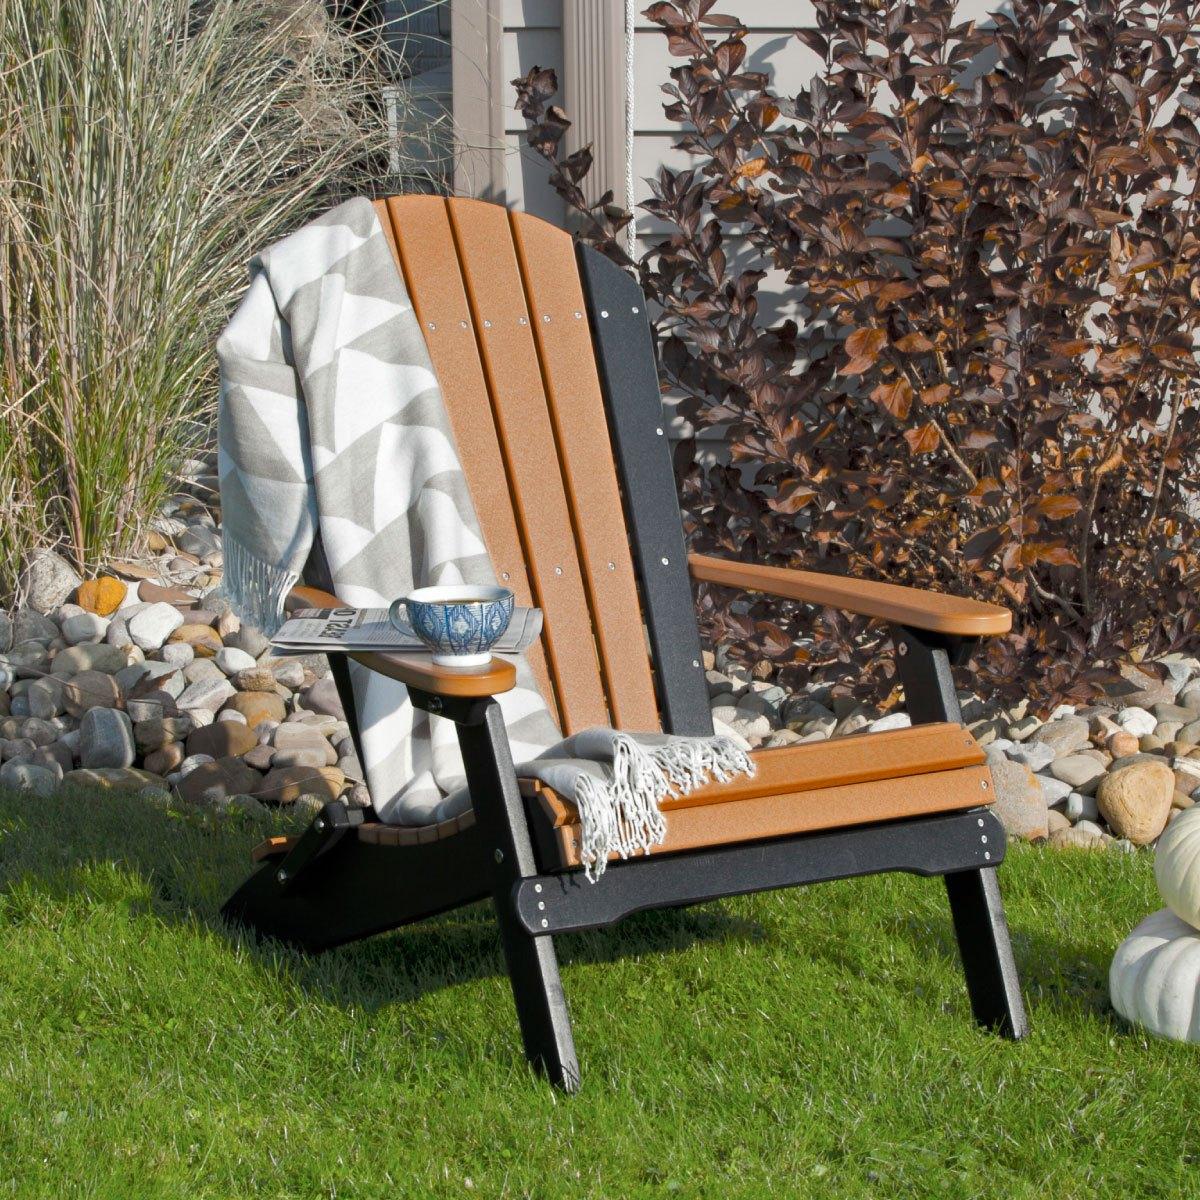 Recycled Plastic Muskoka Chair